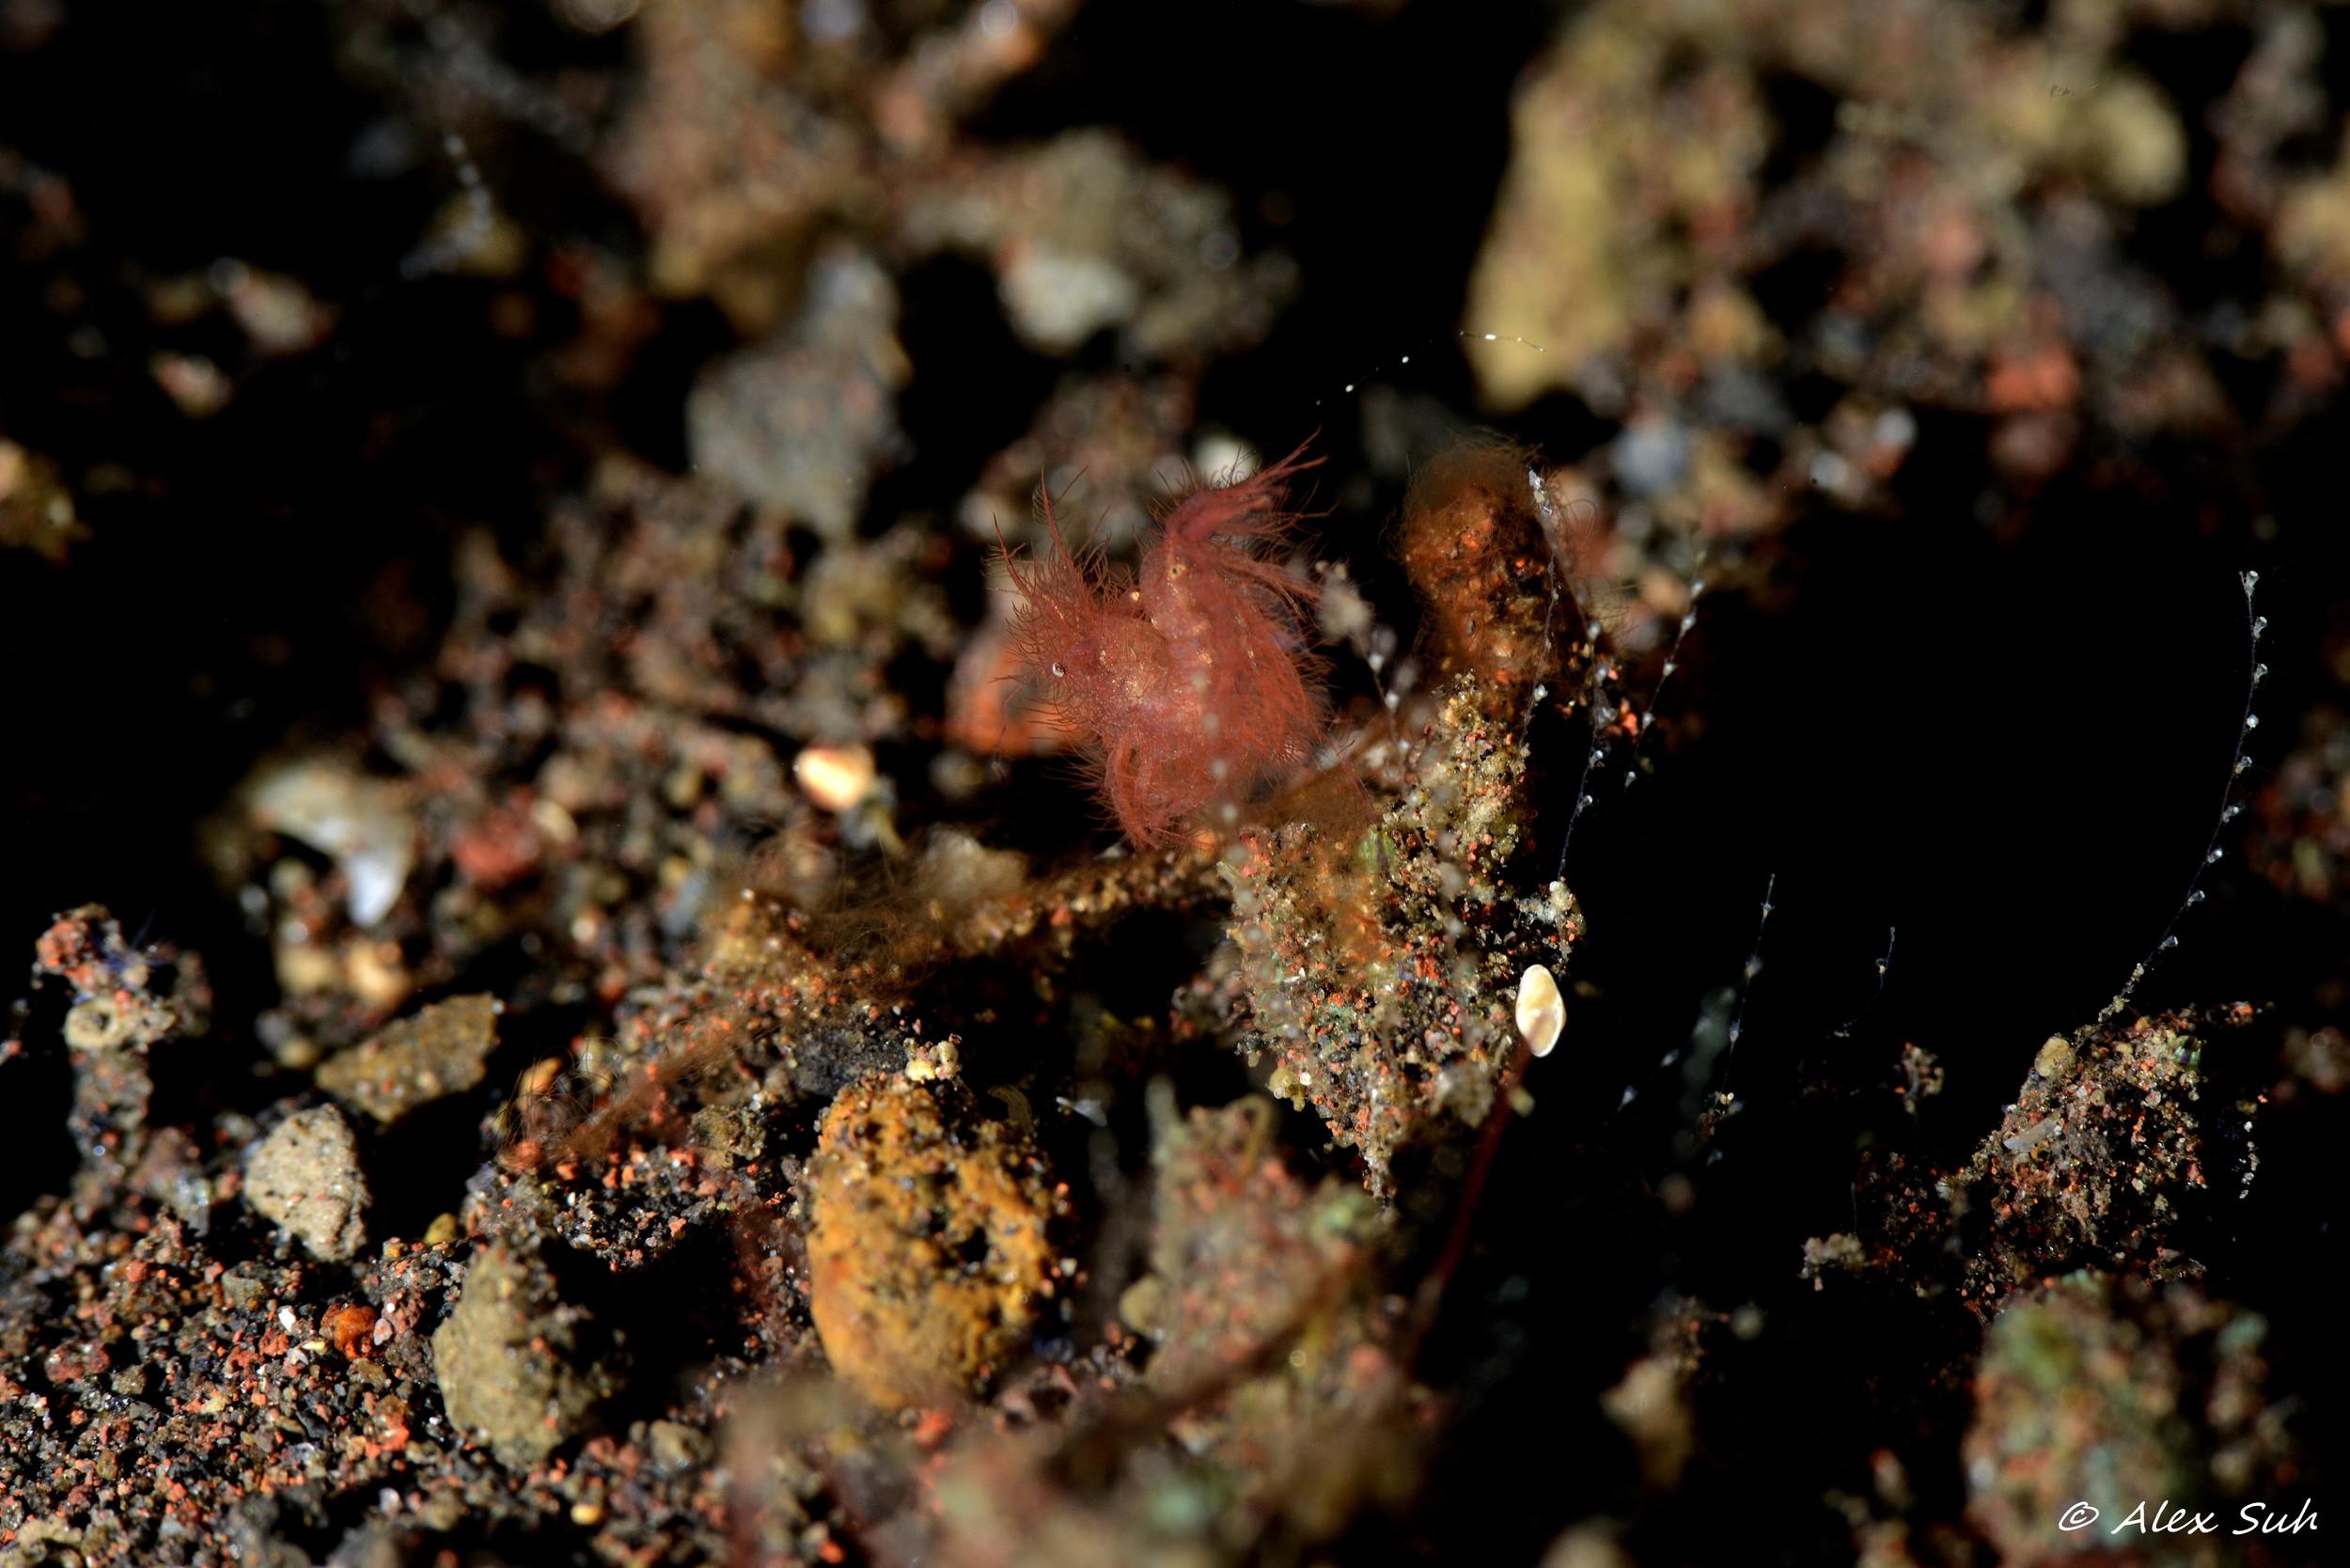 Hairy Shrimp, Phycocaris simulans